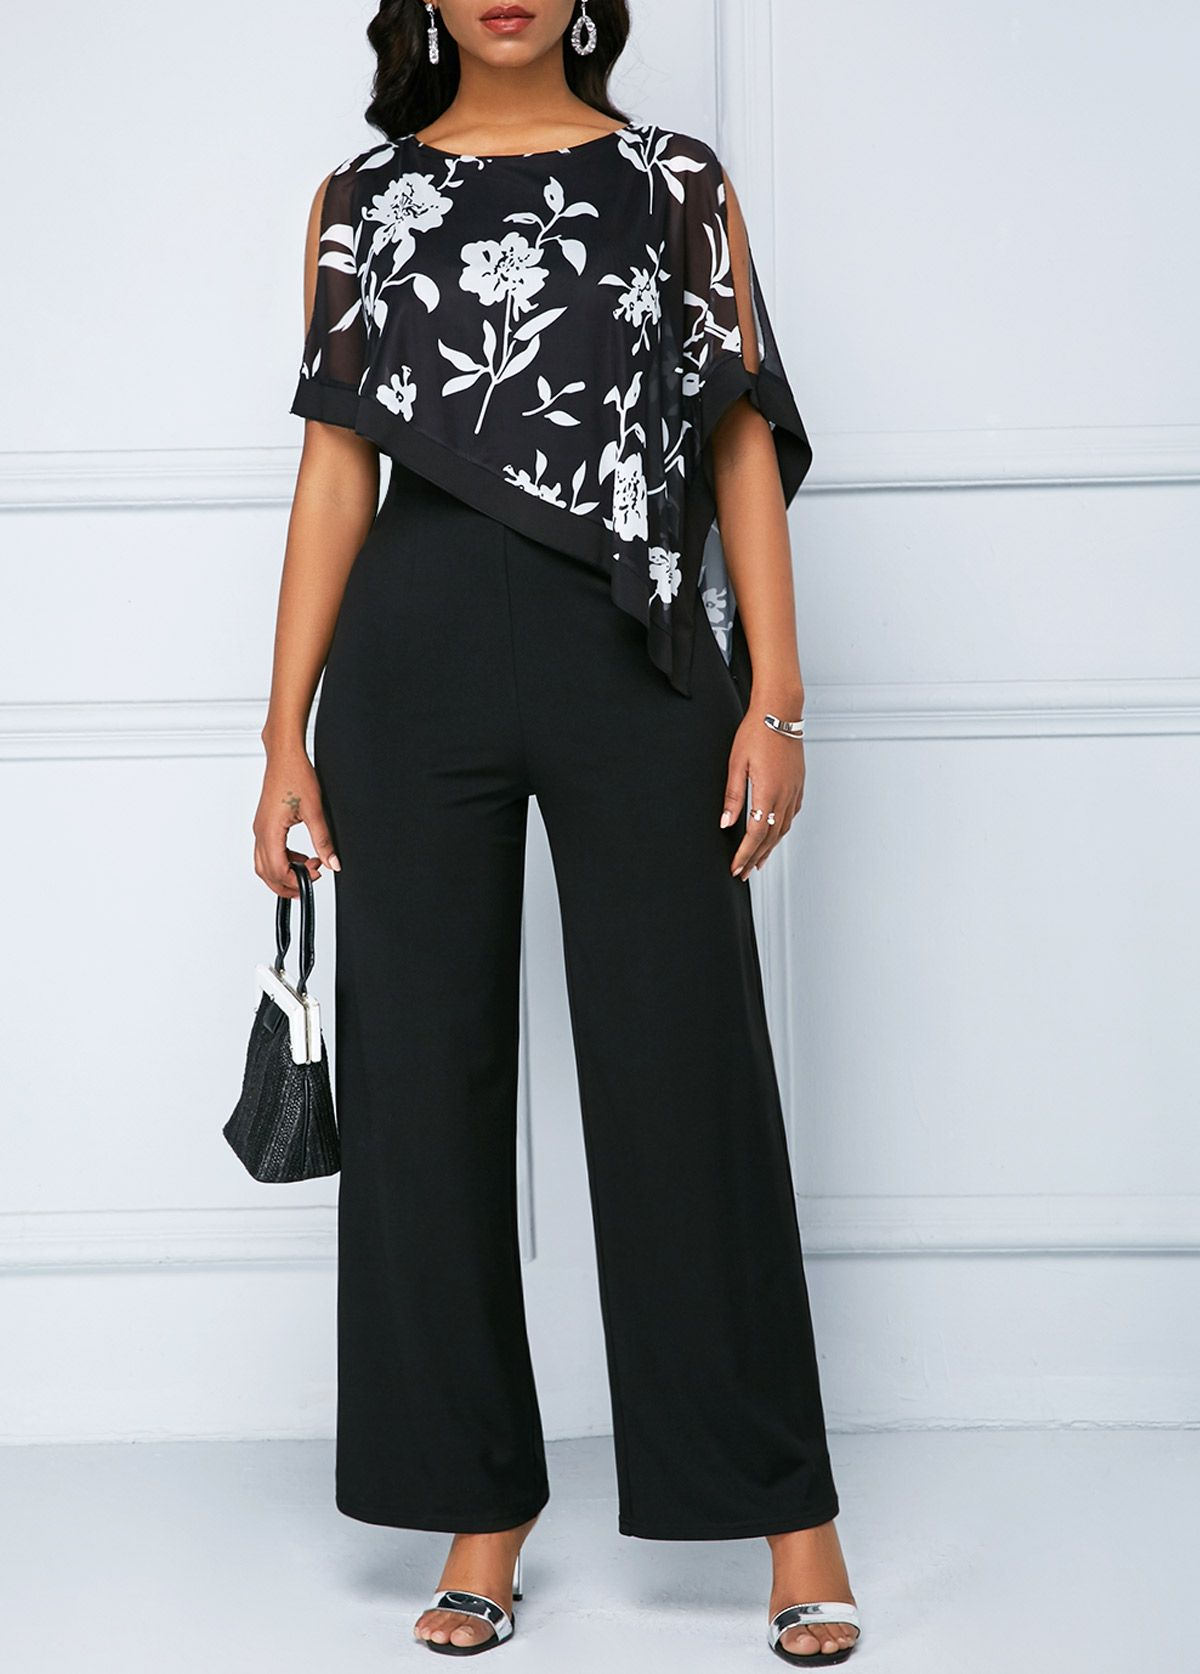 140b2b457e561 Chiffon Overlay Printed Black Split Sleeve Jumpsuit #Printed, #Overlay, # Chiffon